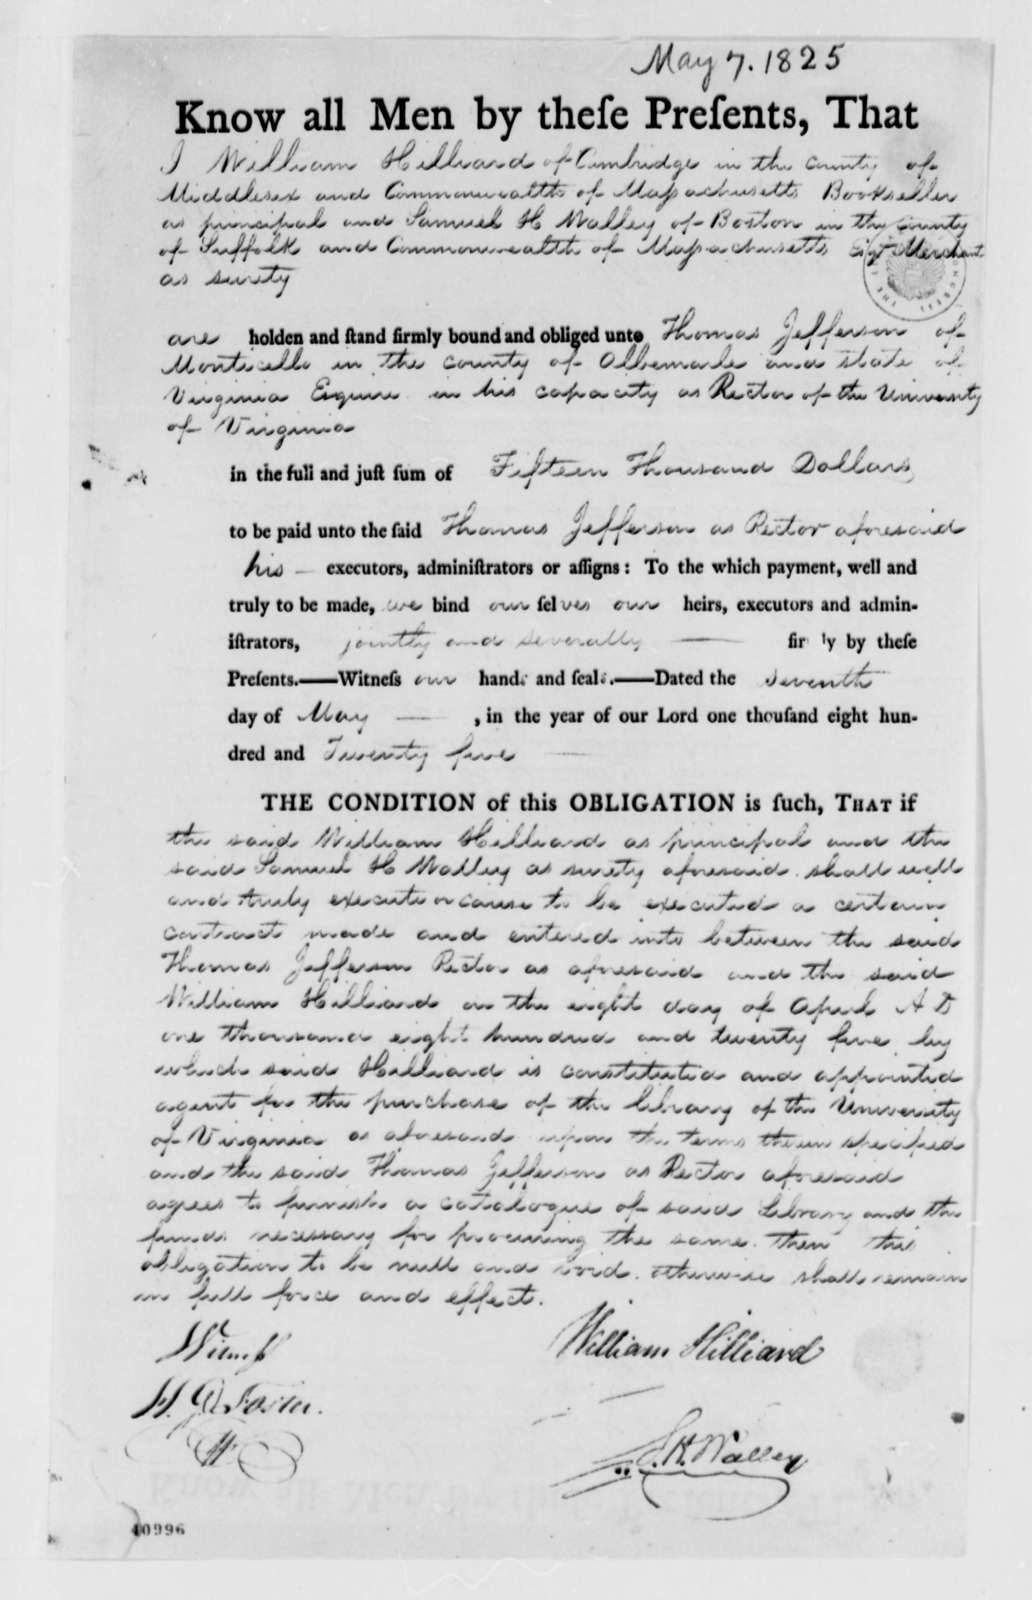 William Hillard and Samuel H. Walley to Thomas Jefferson, May 7, 1825, Bond